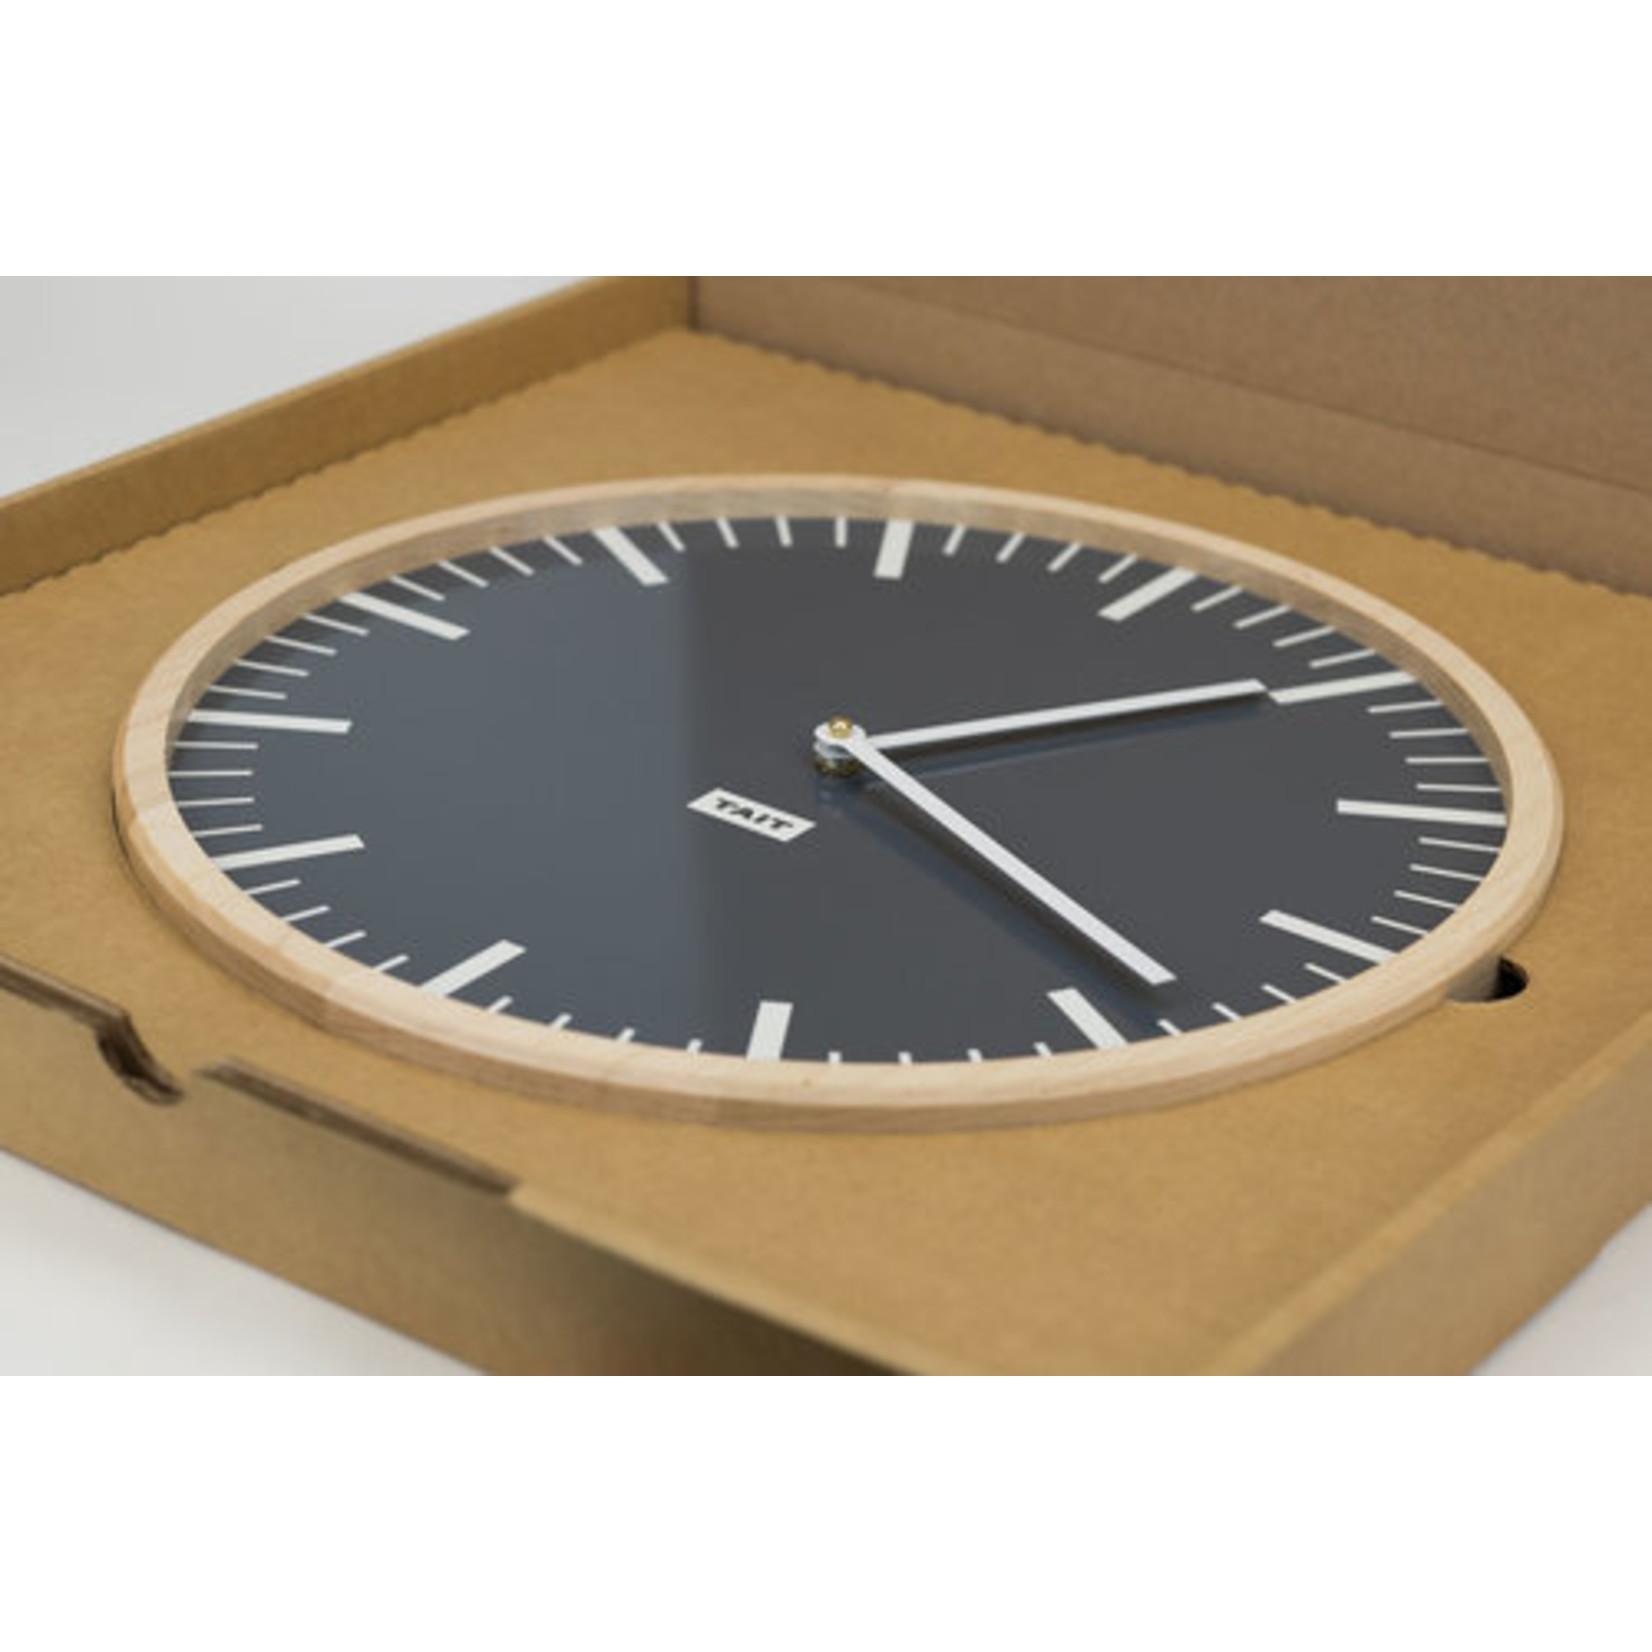 TAIT DESIGN CO. WALL CLOCK - SLATE